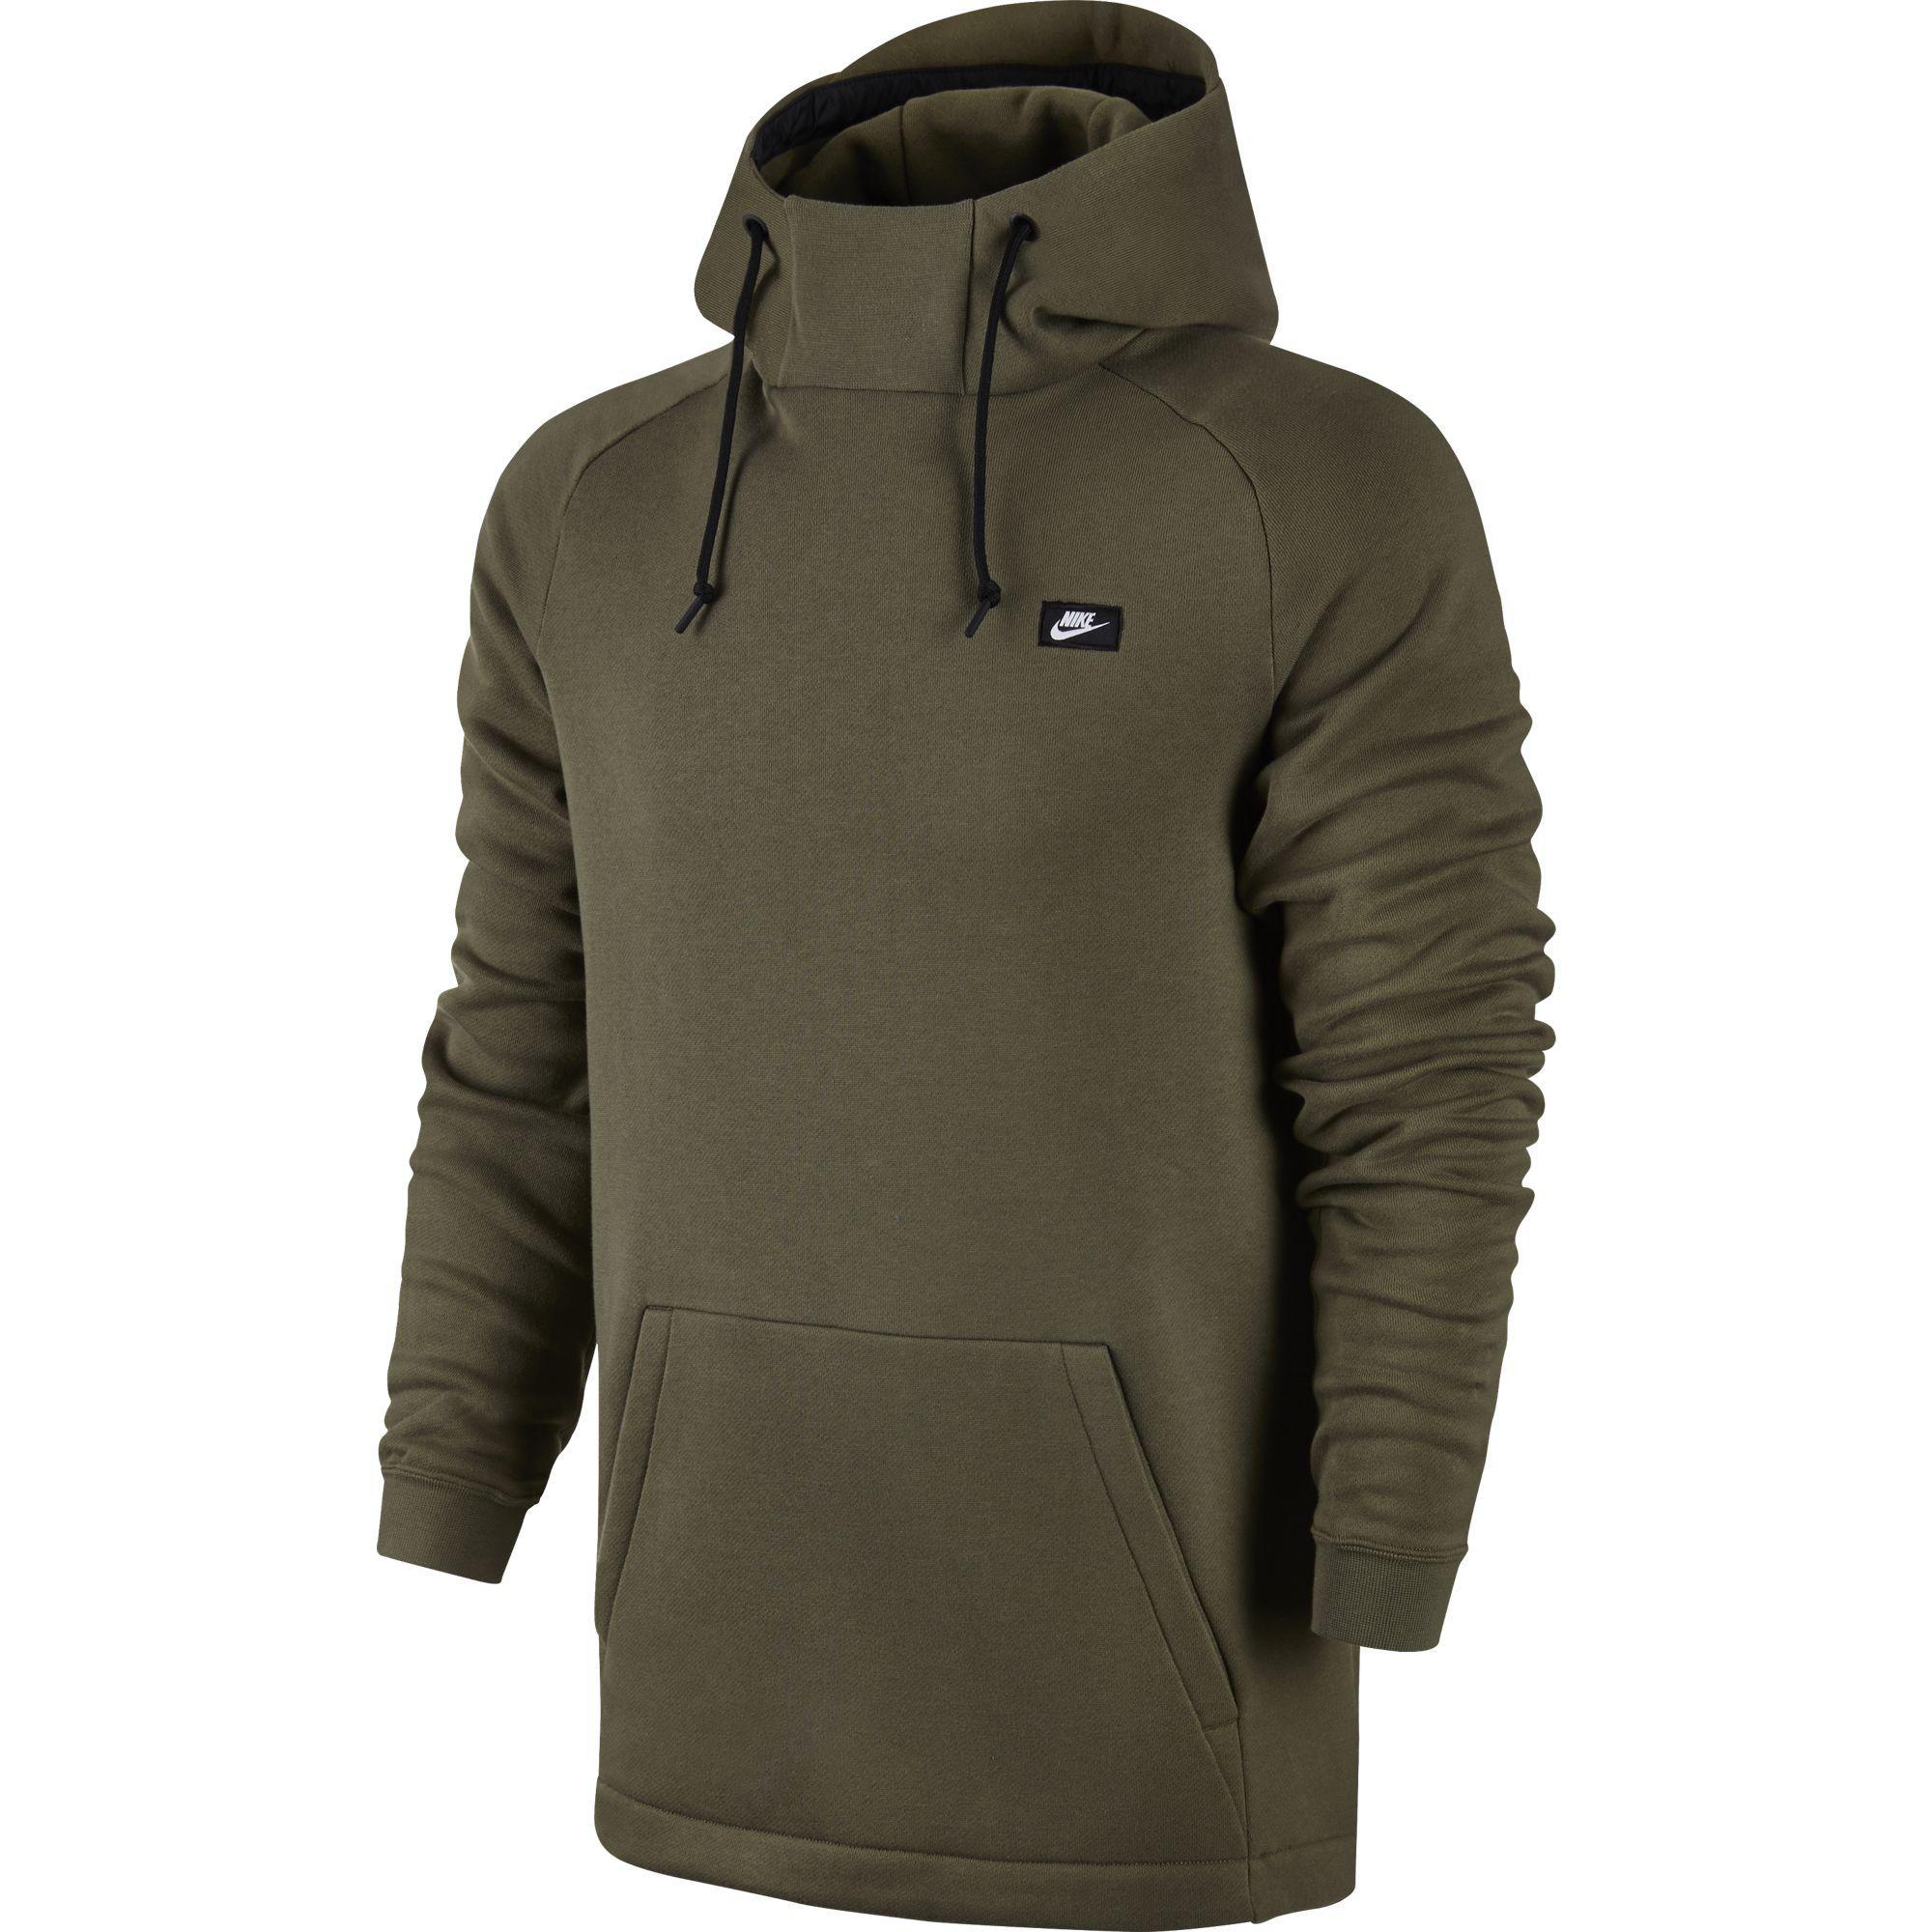 6b3df608152a Nike Mens Modern Pullover Hoodie - Medium Olive - Tennisnuts.com